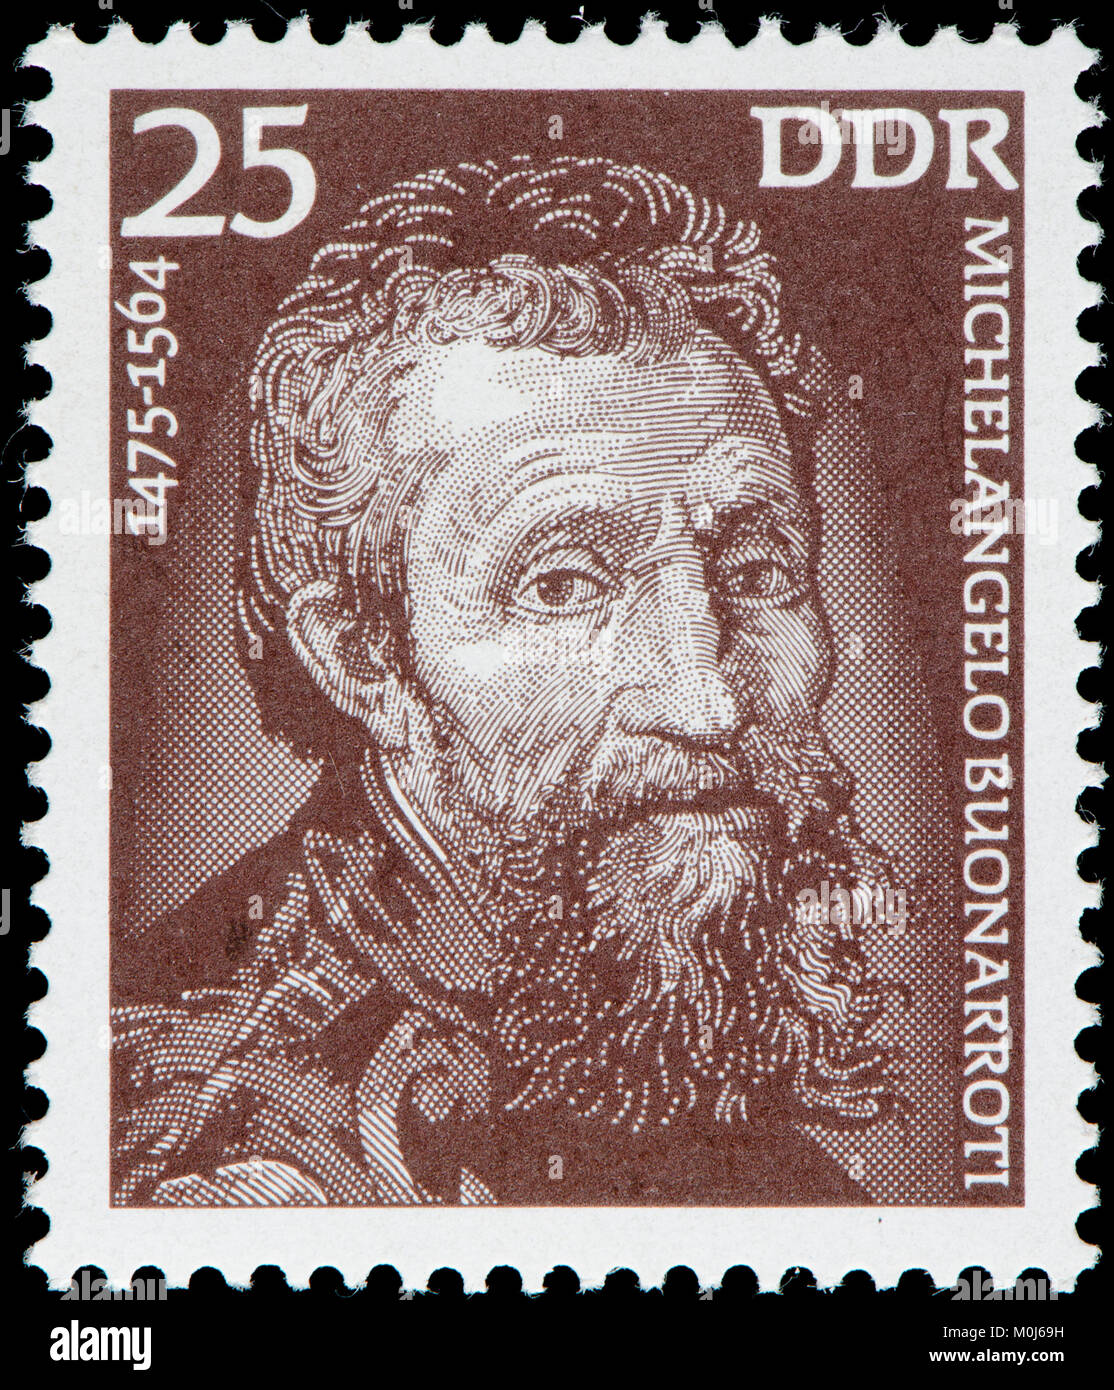 East German postage stamp (1975) : Michelangelo (di Lodovico Buonarroti Simoni) (1475 – 1564) Italian sculptor, painter, architect Stock Photo